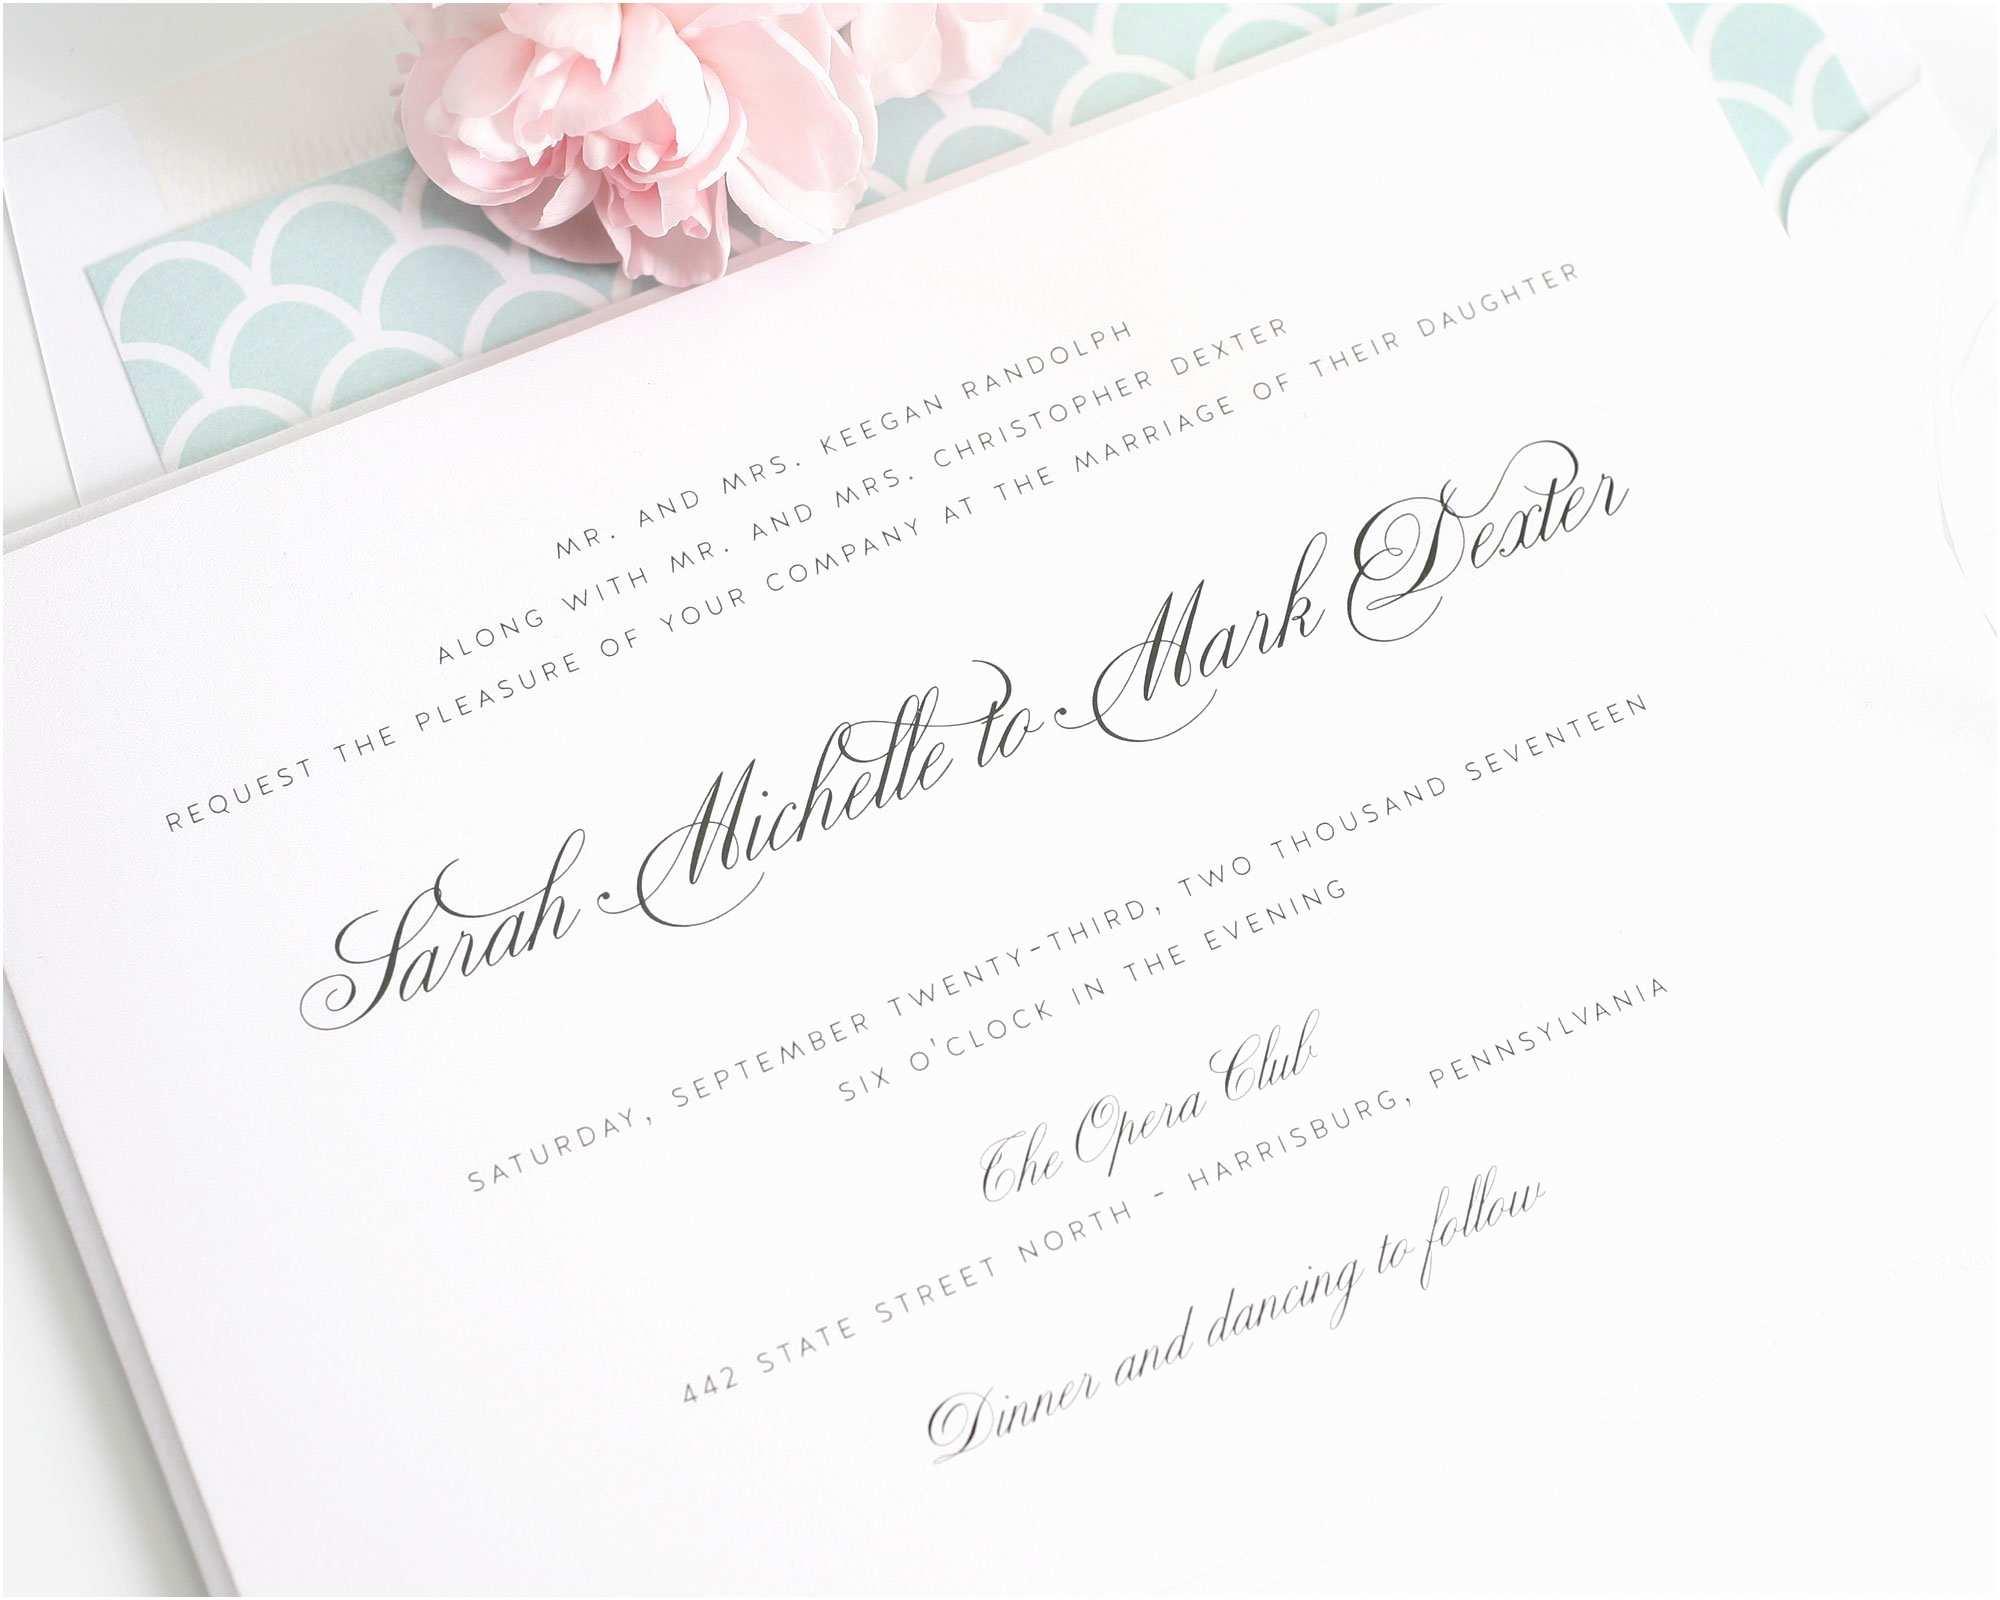 Wedding Invitation Stationery Wedding Invitation Tips – Page 2 – Wedding Invitations